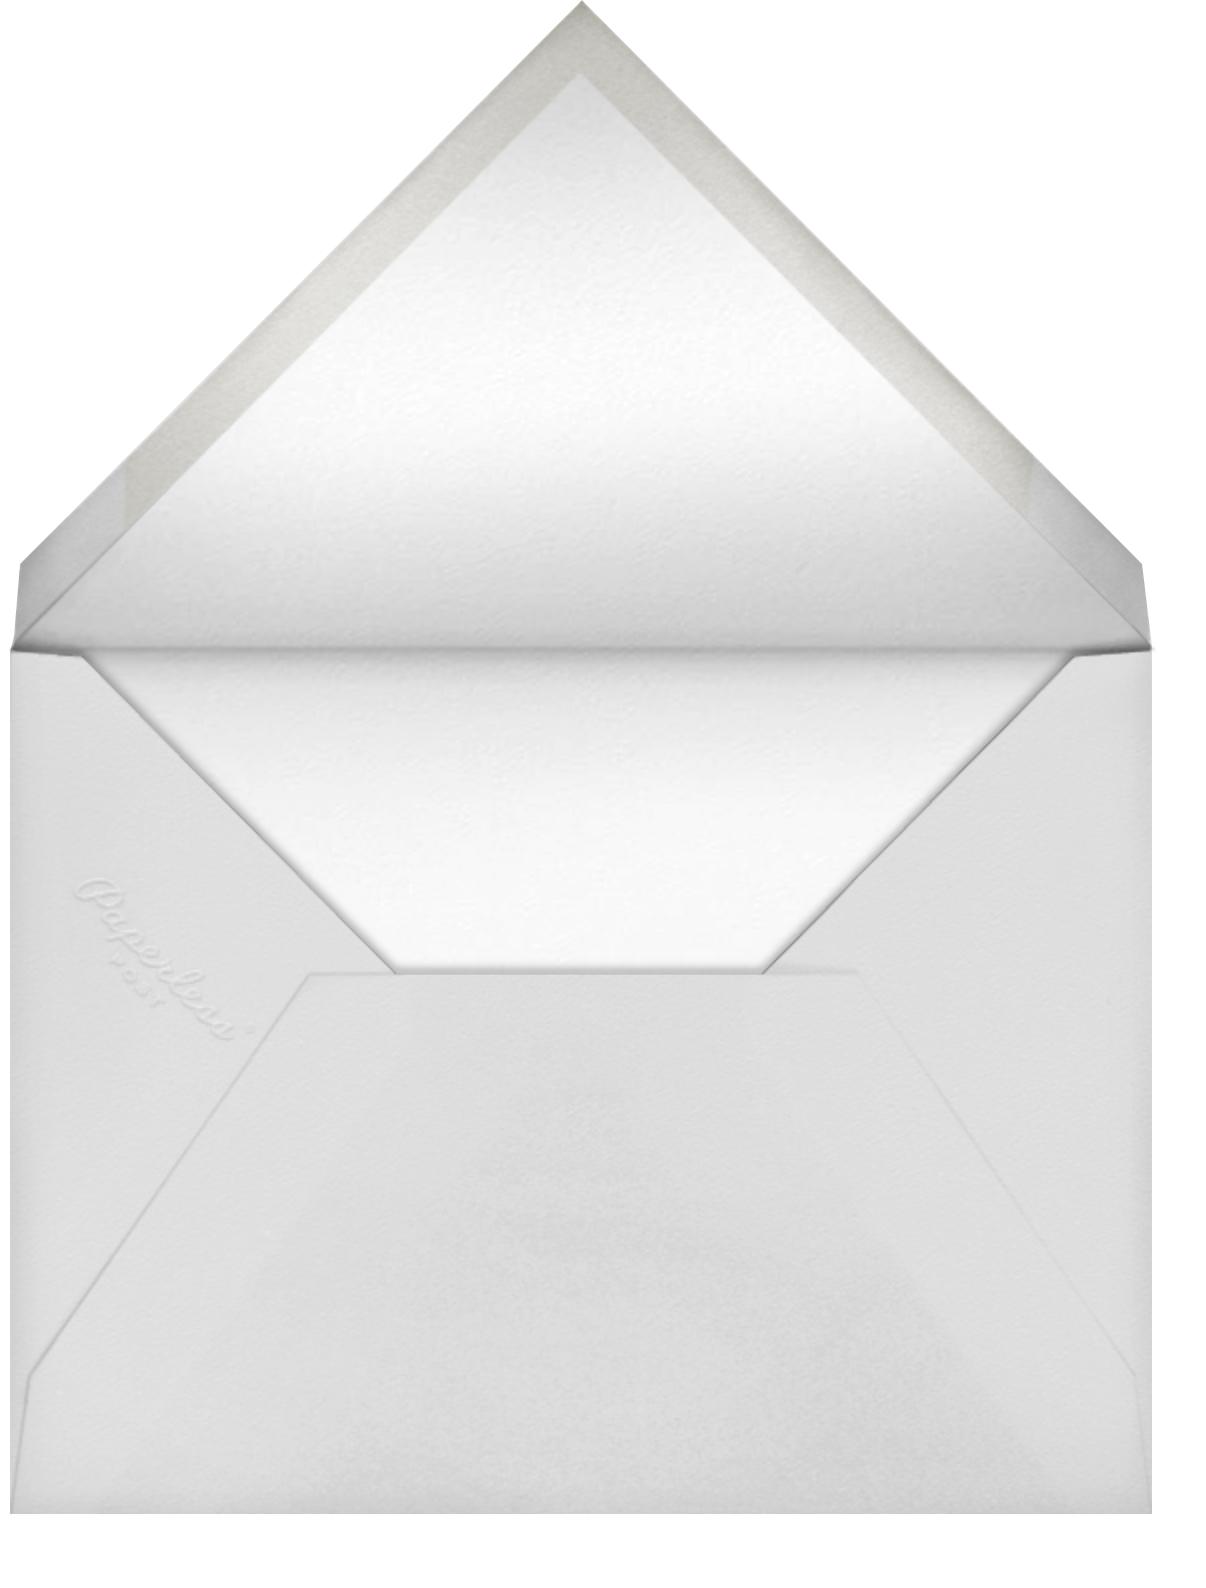 Fleurs d'Alençon - Antwerp - Oscar de la Renta - Baby shower - envelope back